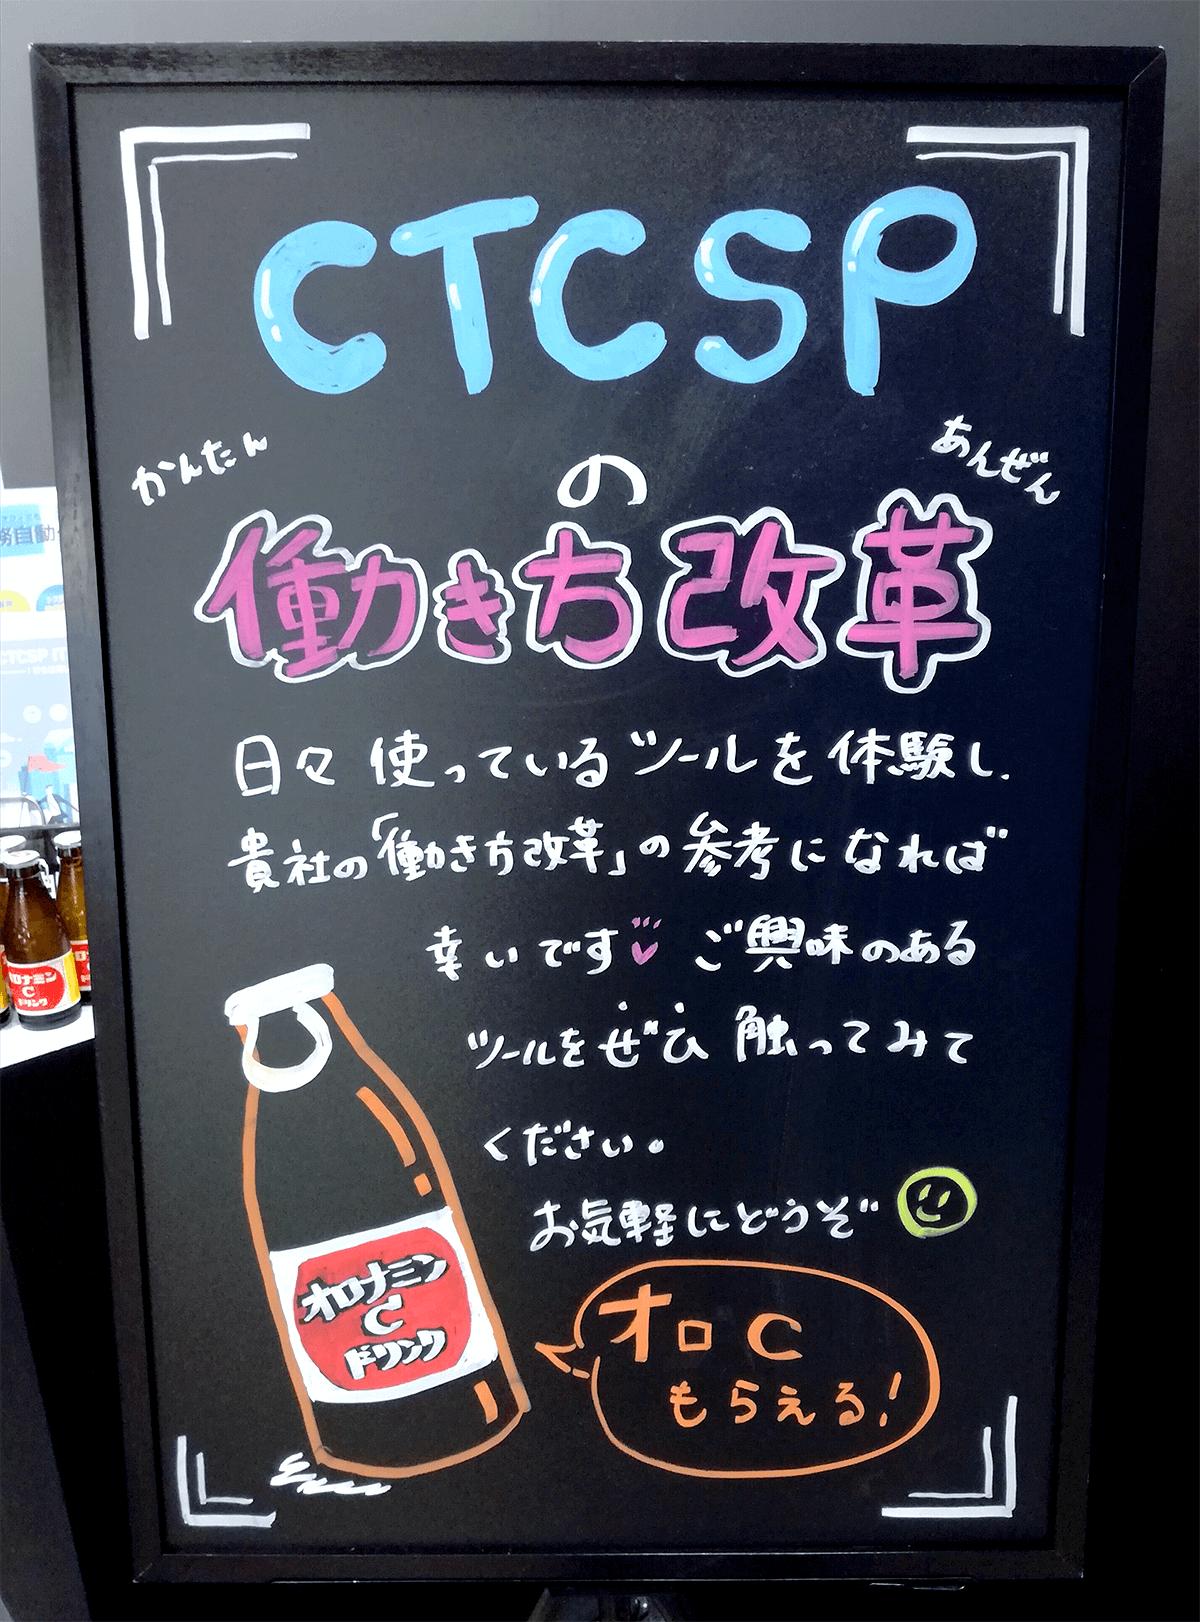 CTCSPの働き方改革